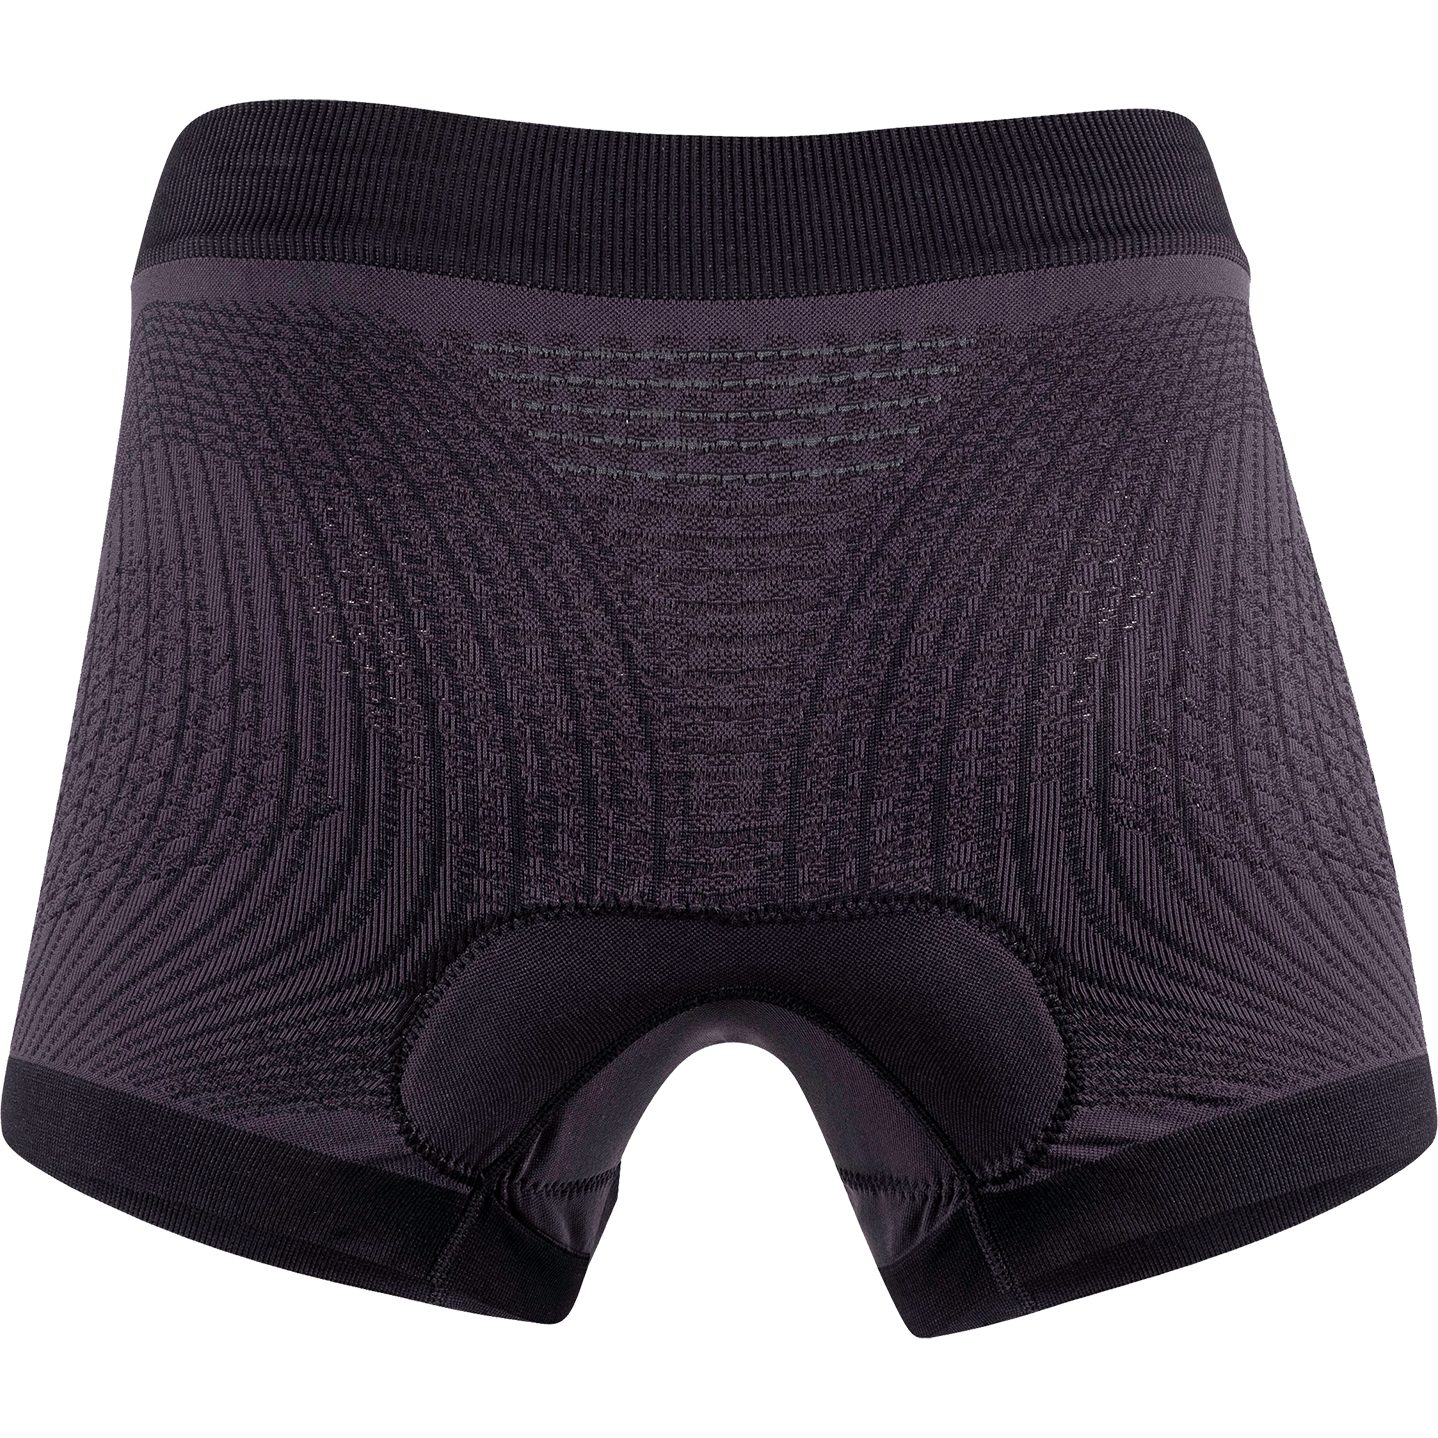 Image of UYN Lady Motyon 2.0 Underwear Boxer Whit Pad - Black Board/White